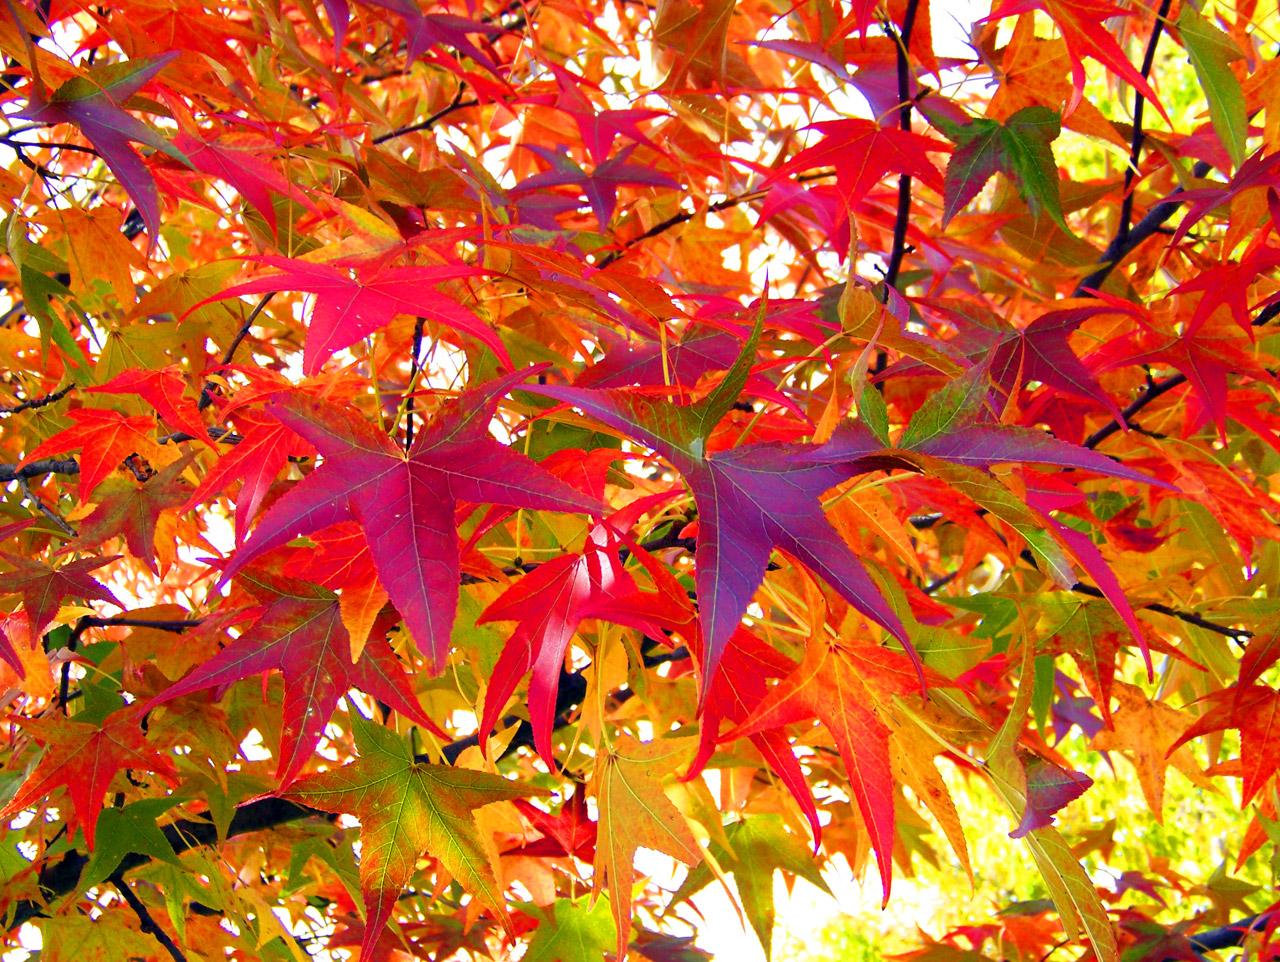 autumn-leaves-13016839608be.jpg